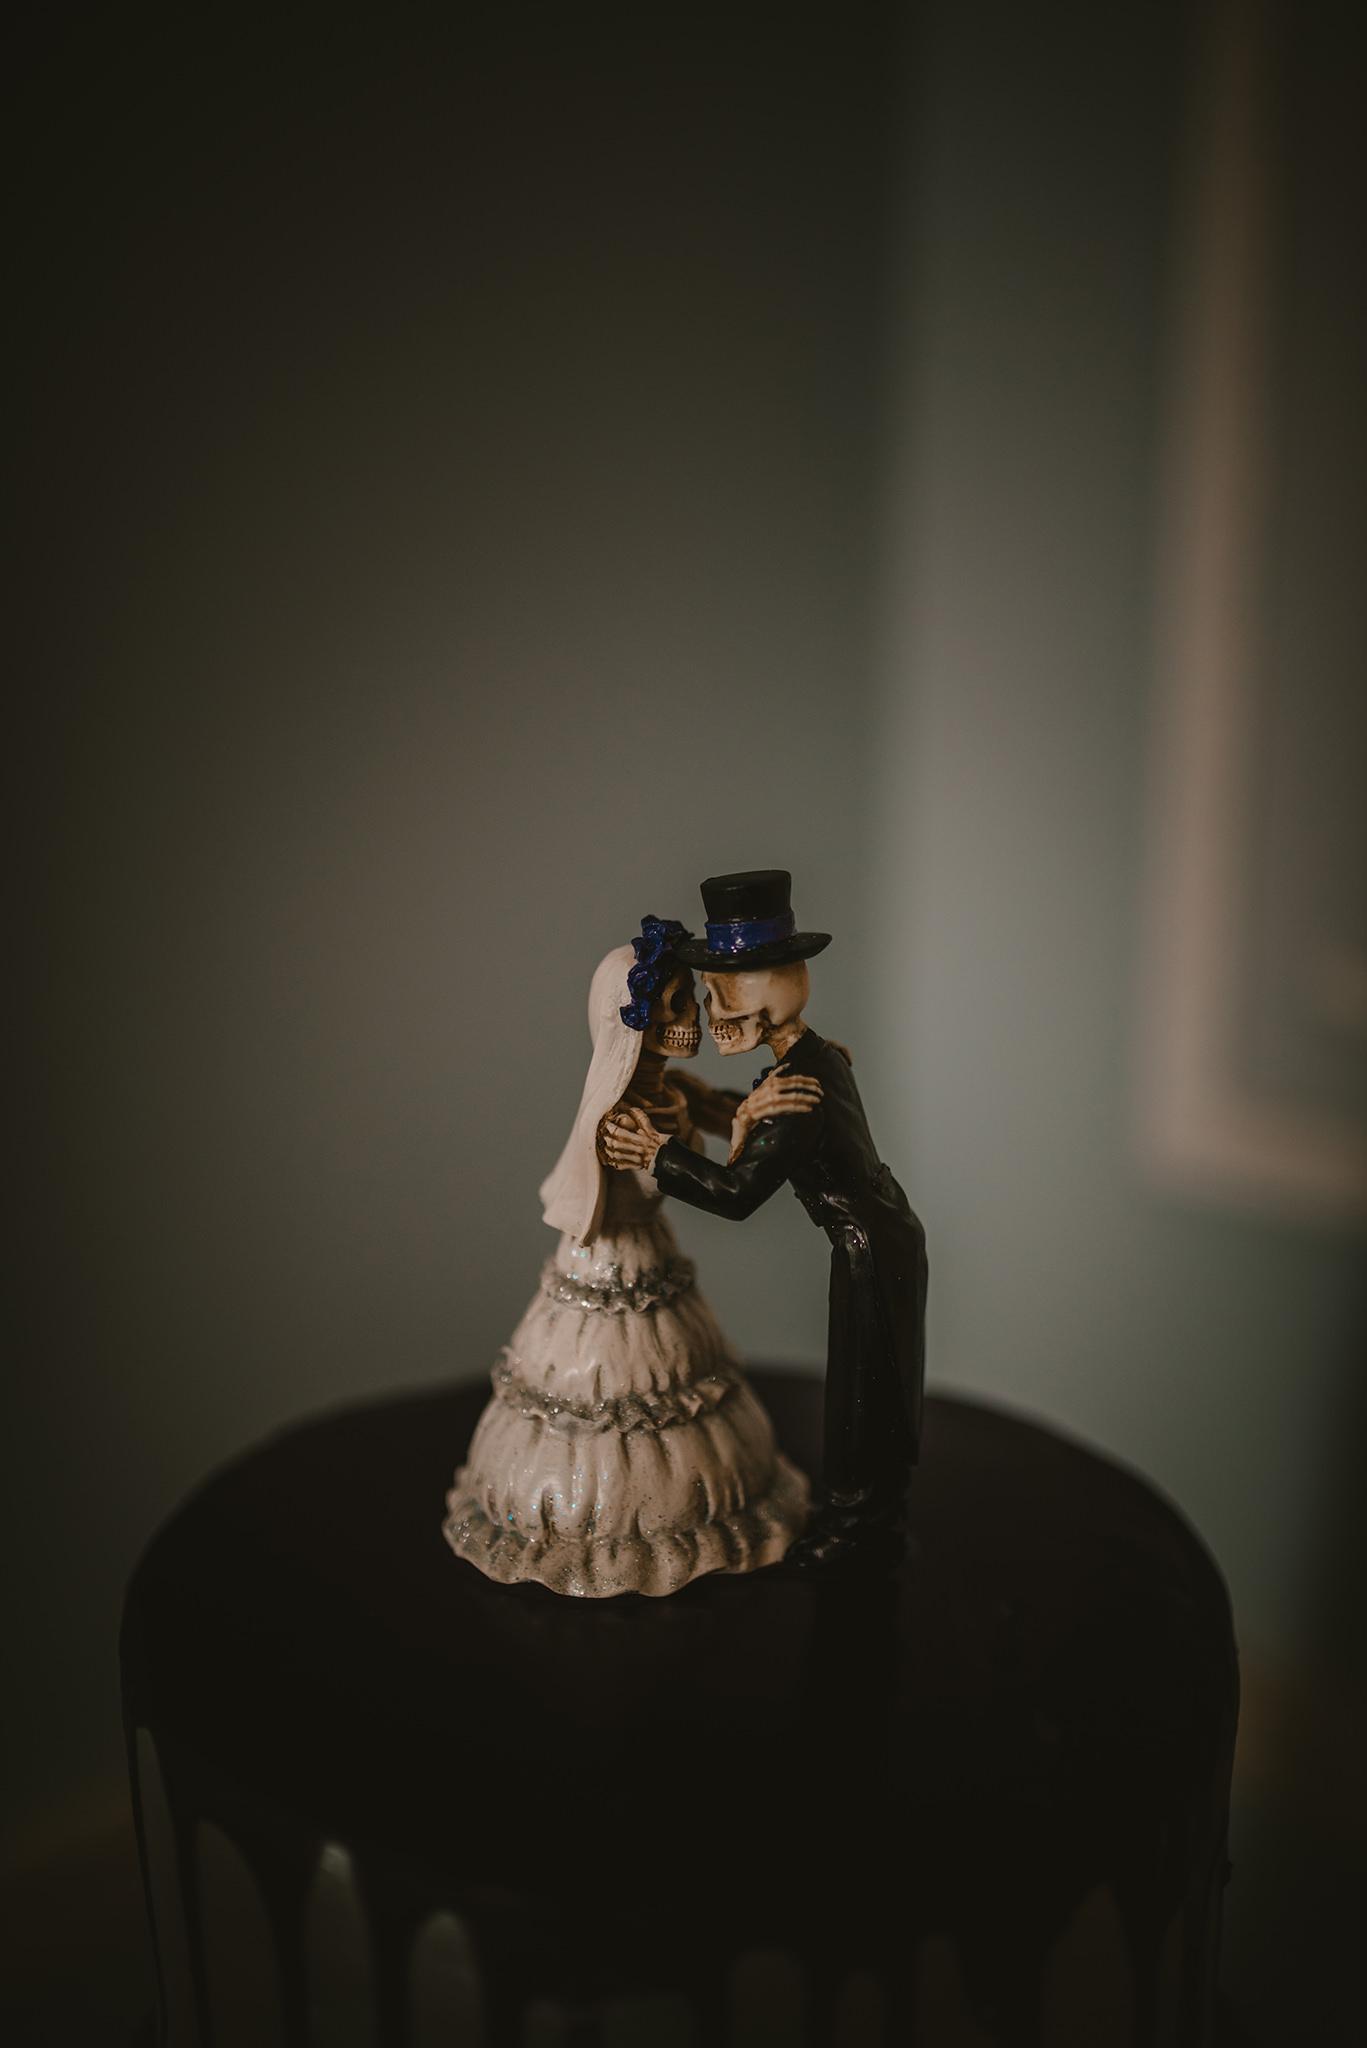 malone house wedding alternative skeleton cake toppers